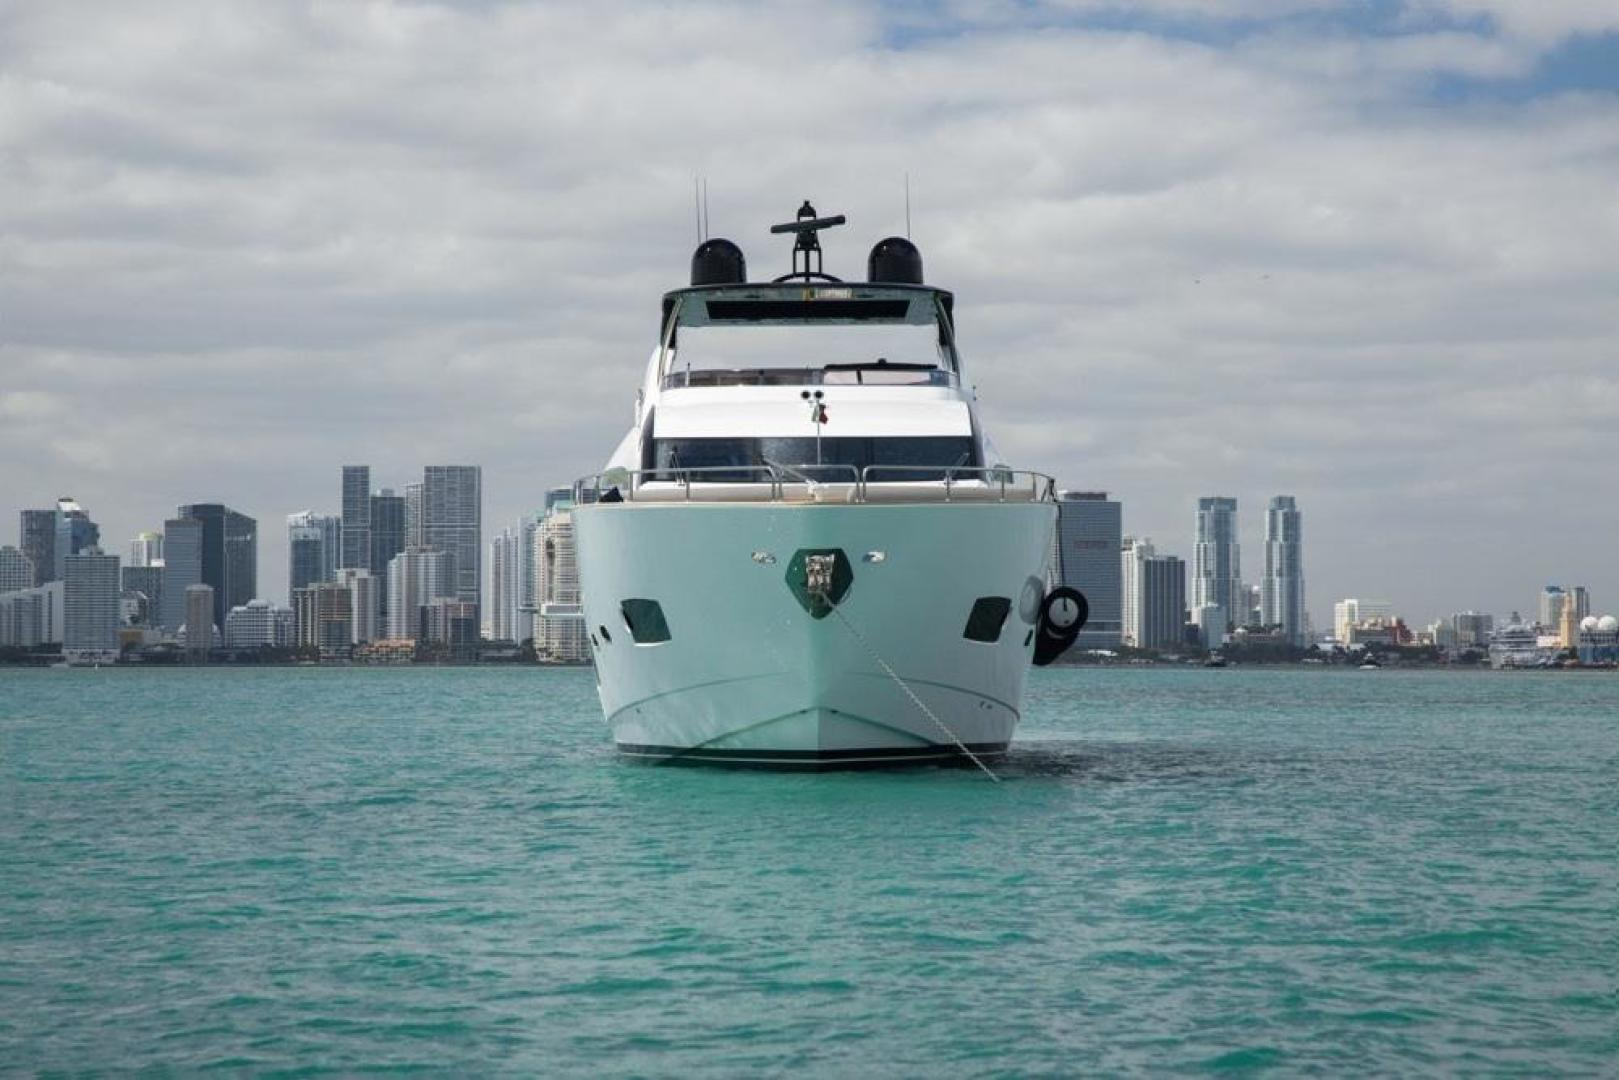 Sunseeker-28 Metre Yacht 2016-RIII Miami-Florida-United States-600079 | Thumbnail